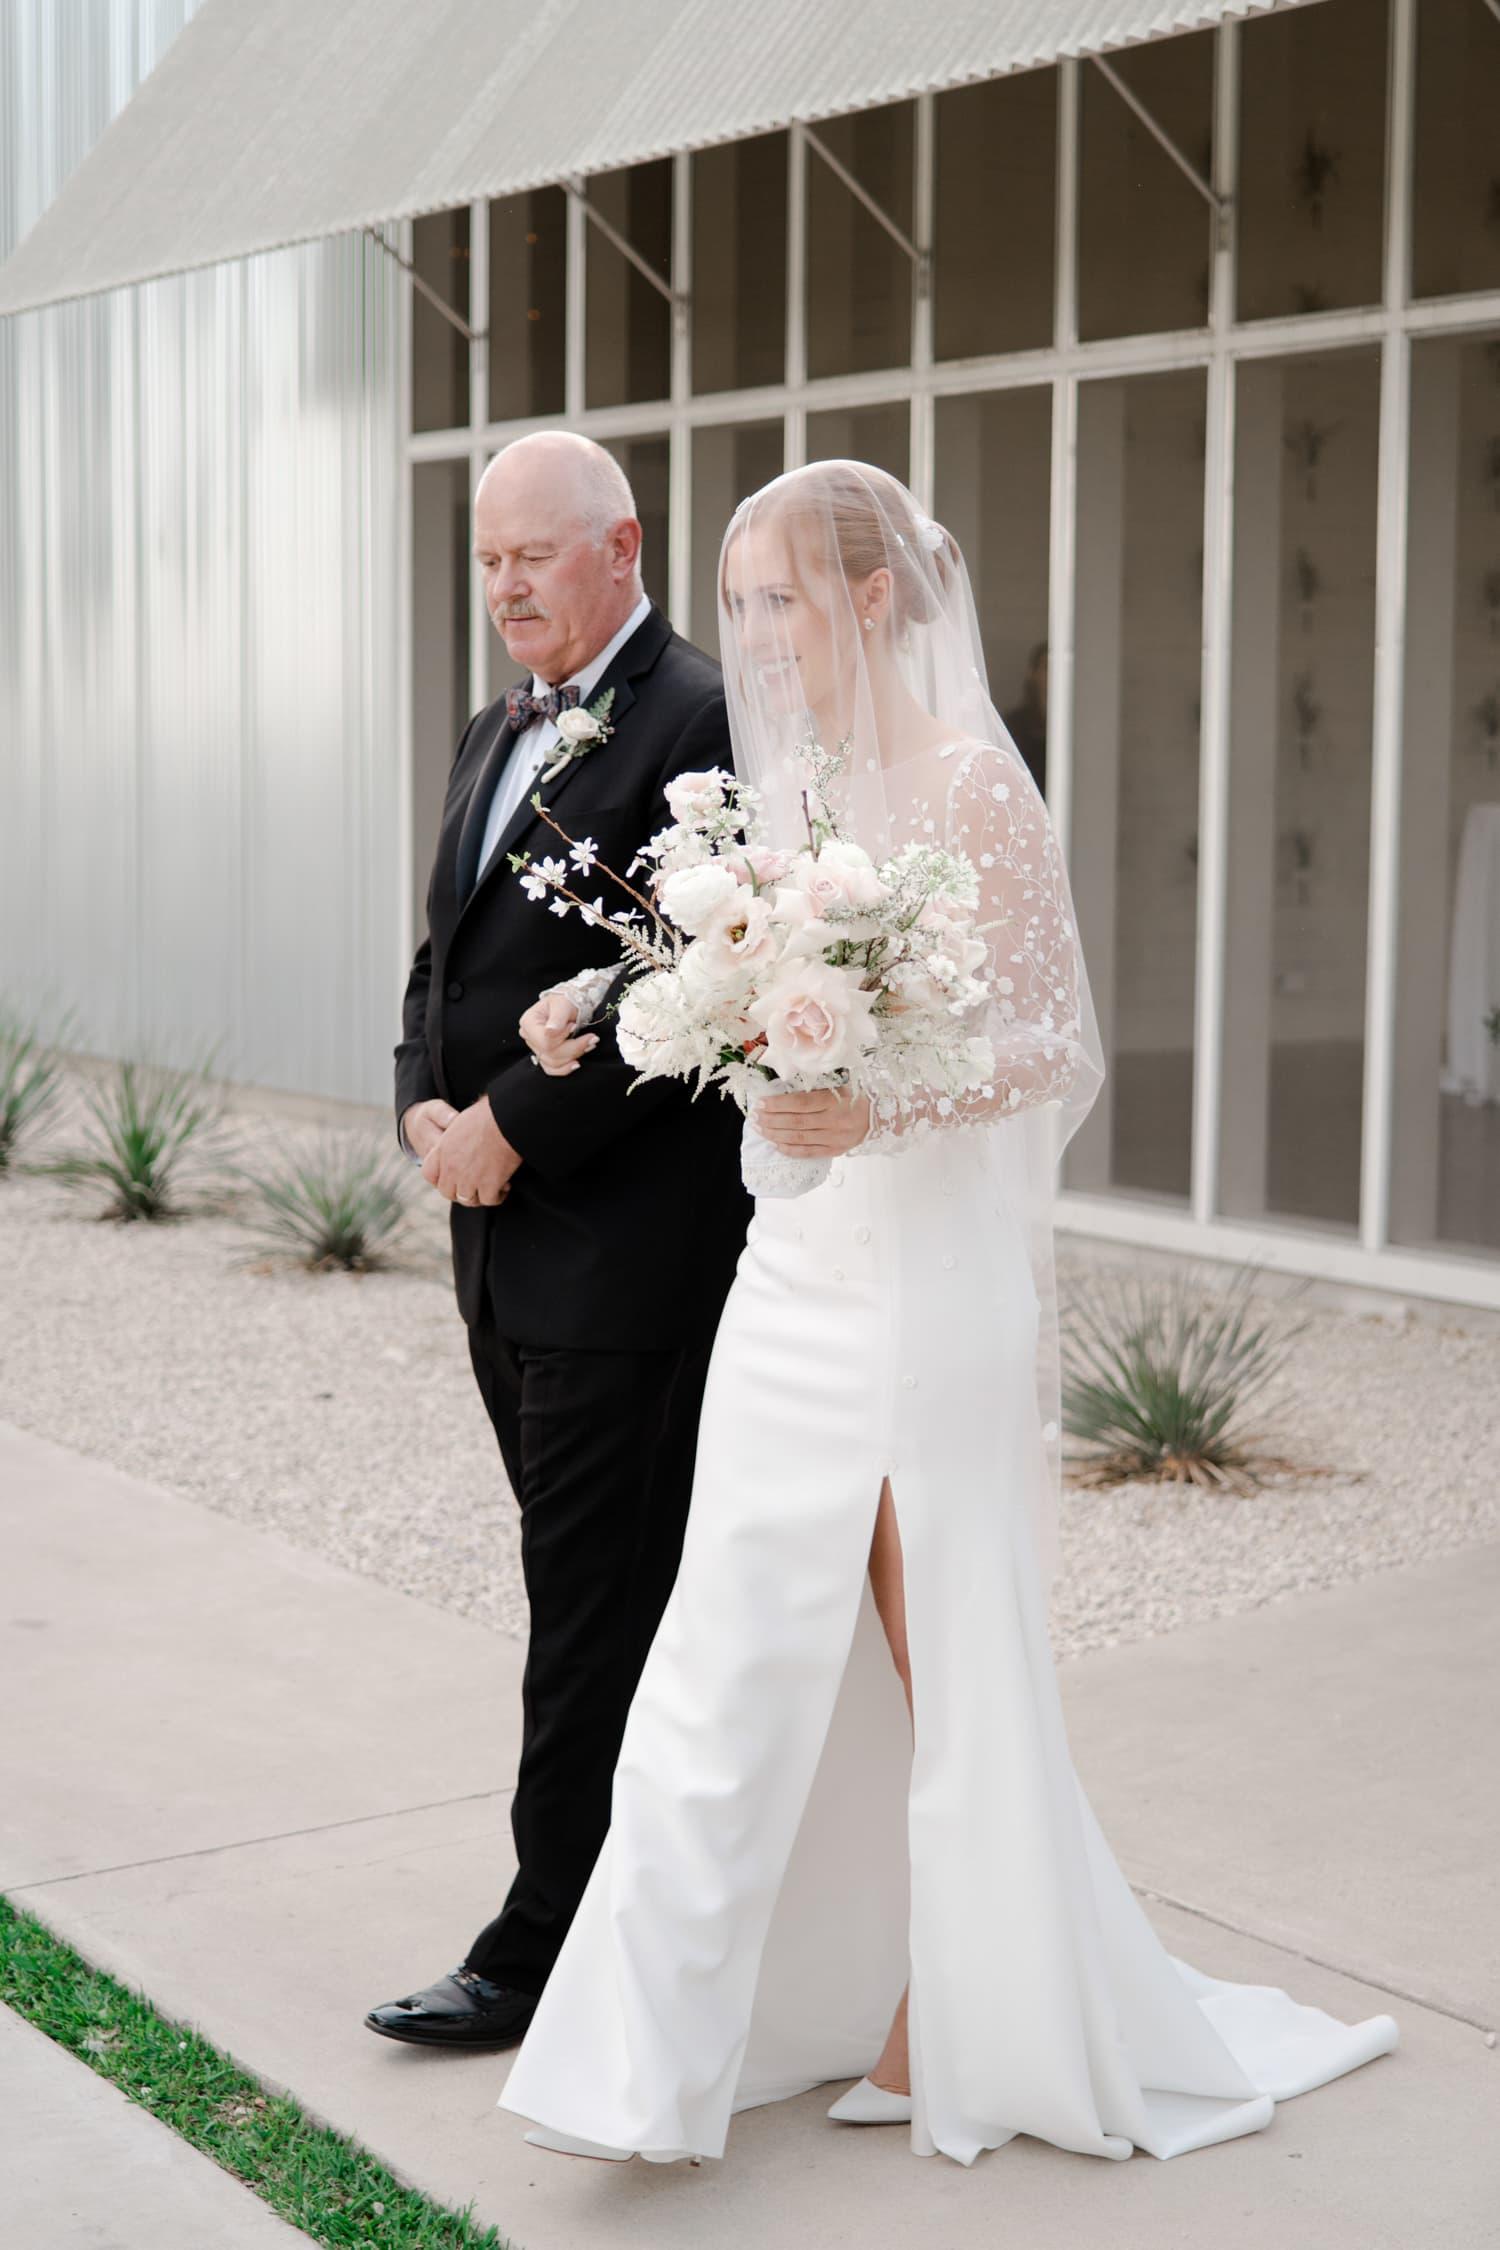 prospect-house-wedding-28.jpg